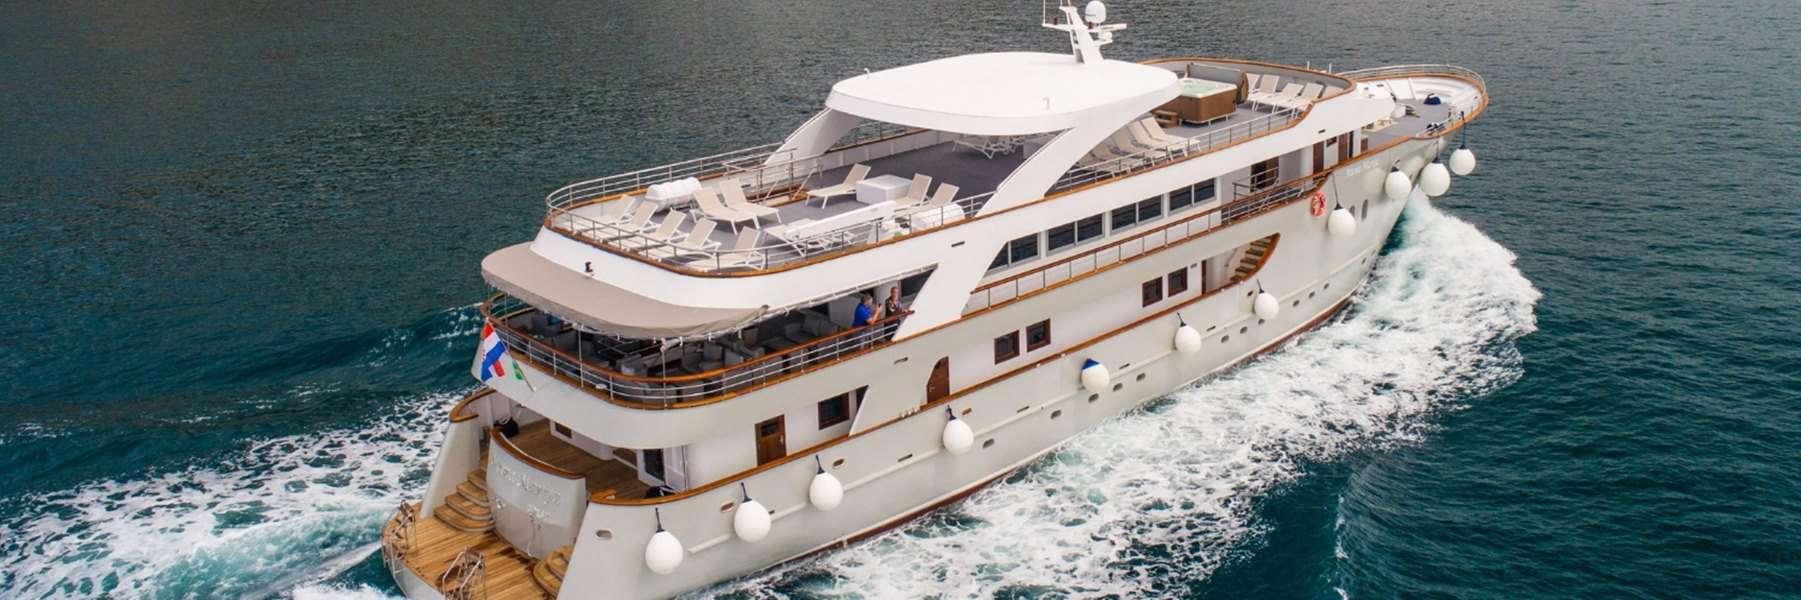 MS Mama Marija Cruise Ship, Croatia